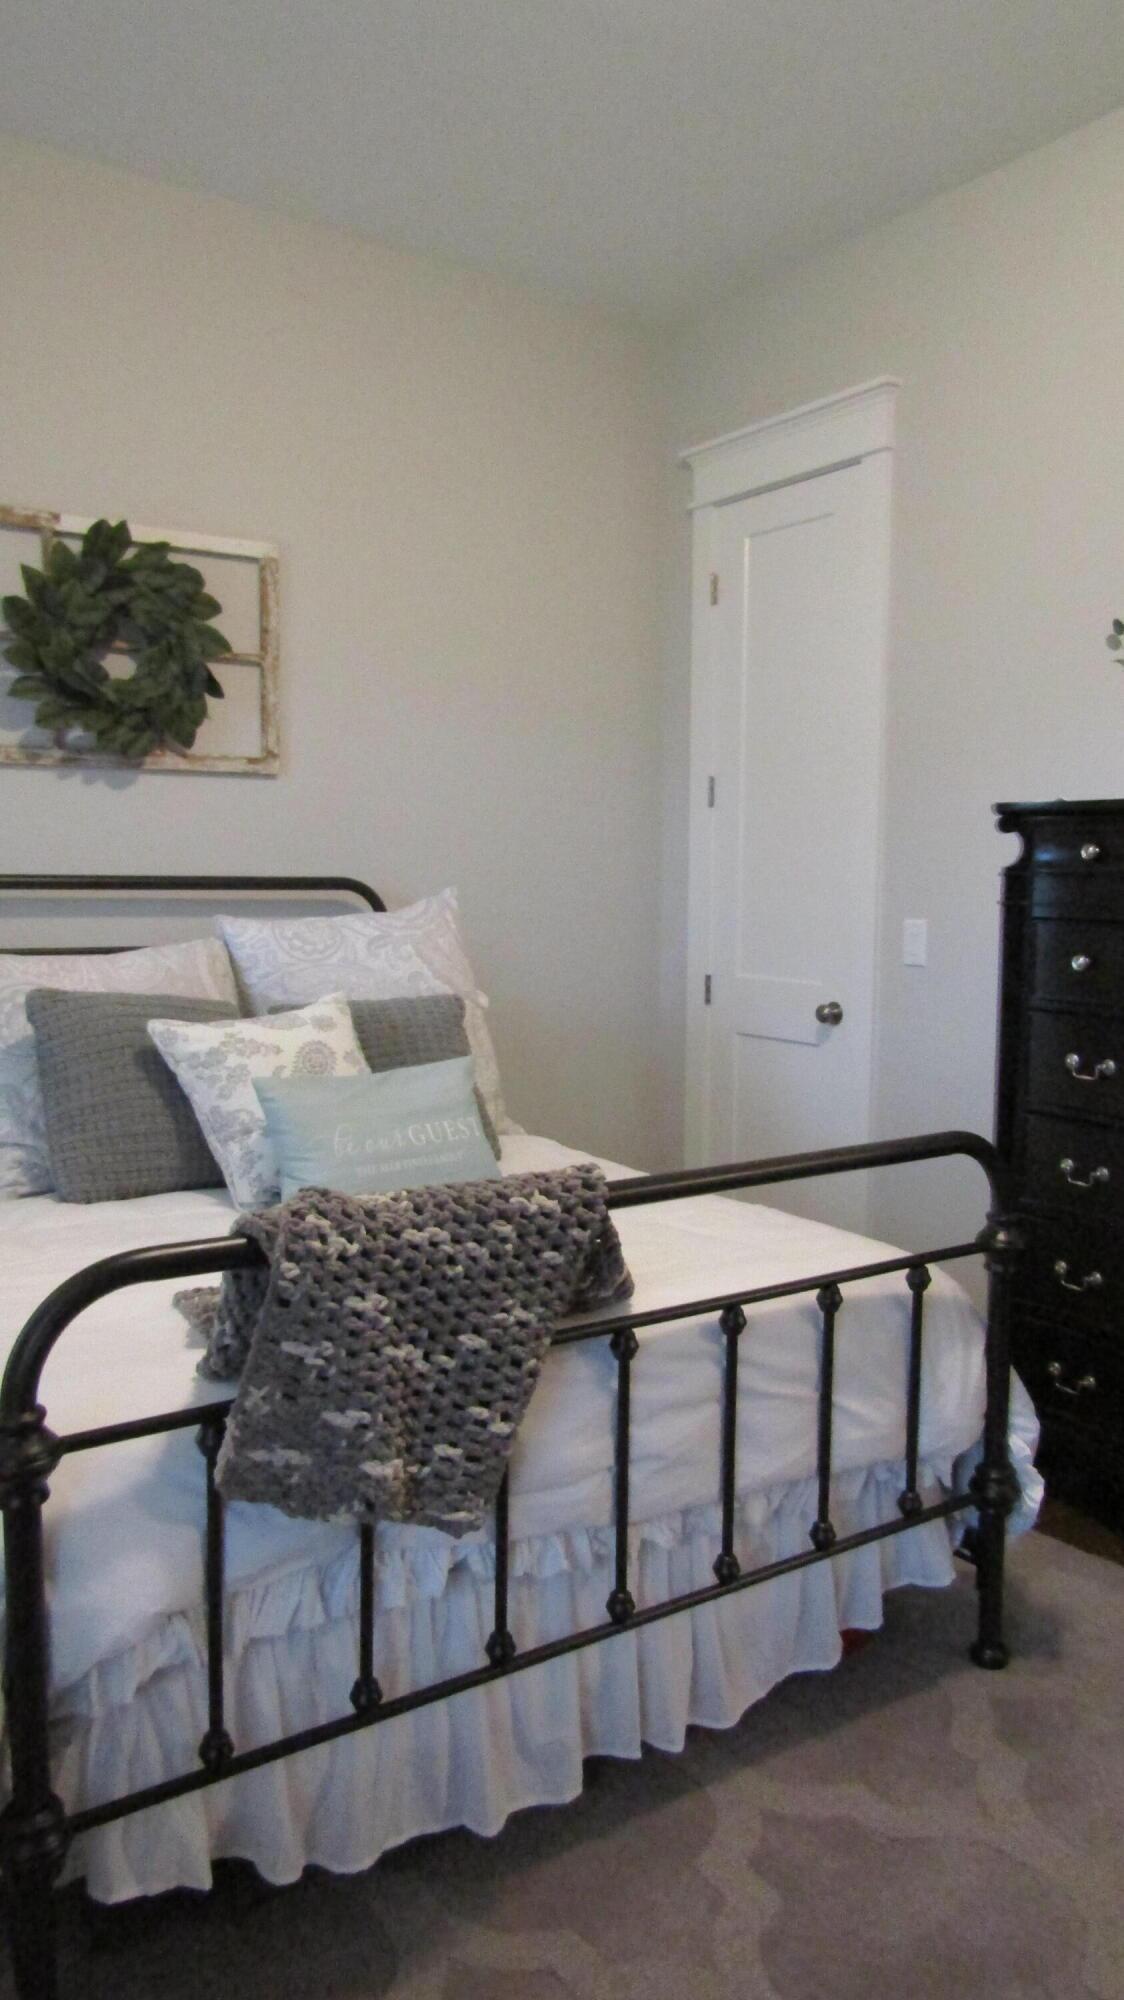 Carolina Park Homes For Sale - 3533 Crosstrees, Mount Pleasant, SC - 1